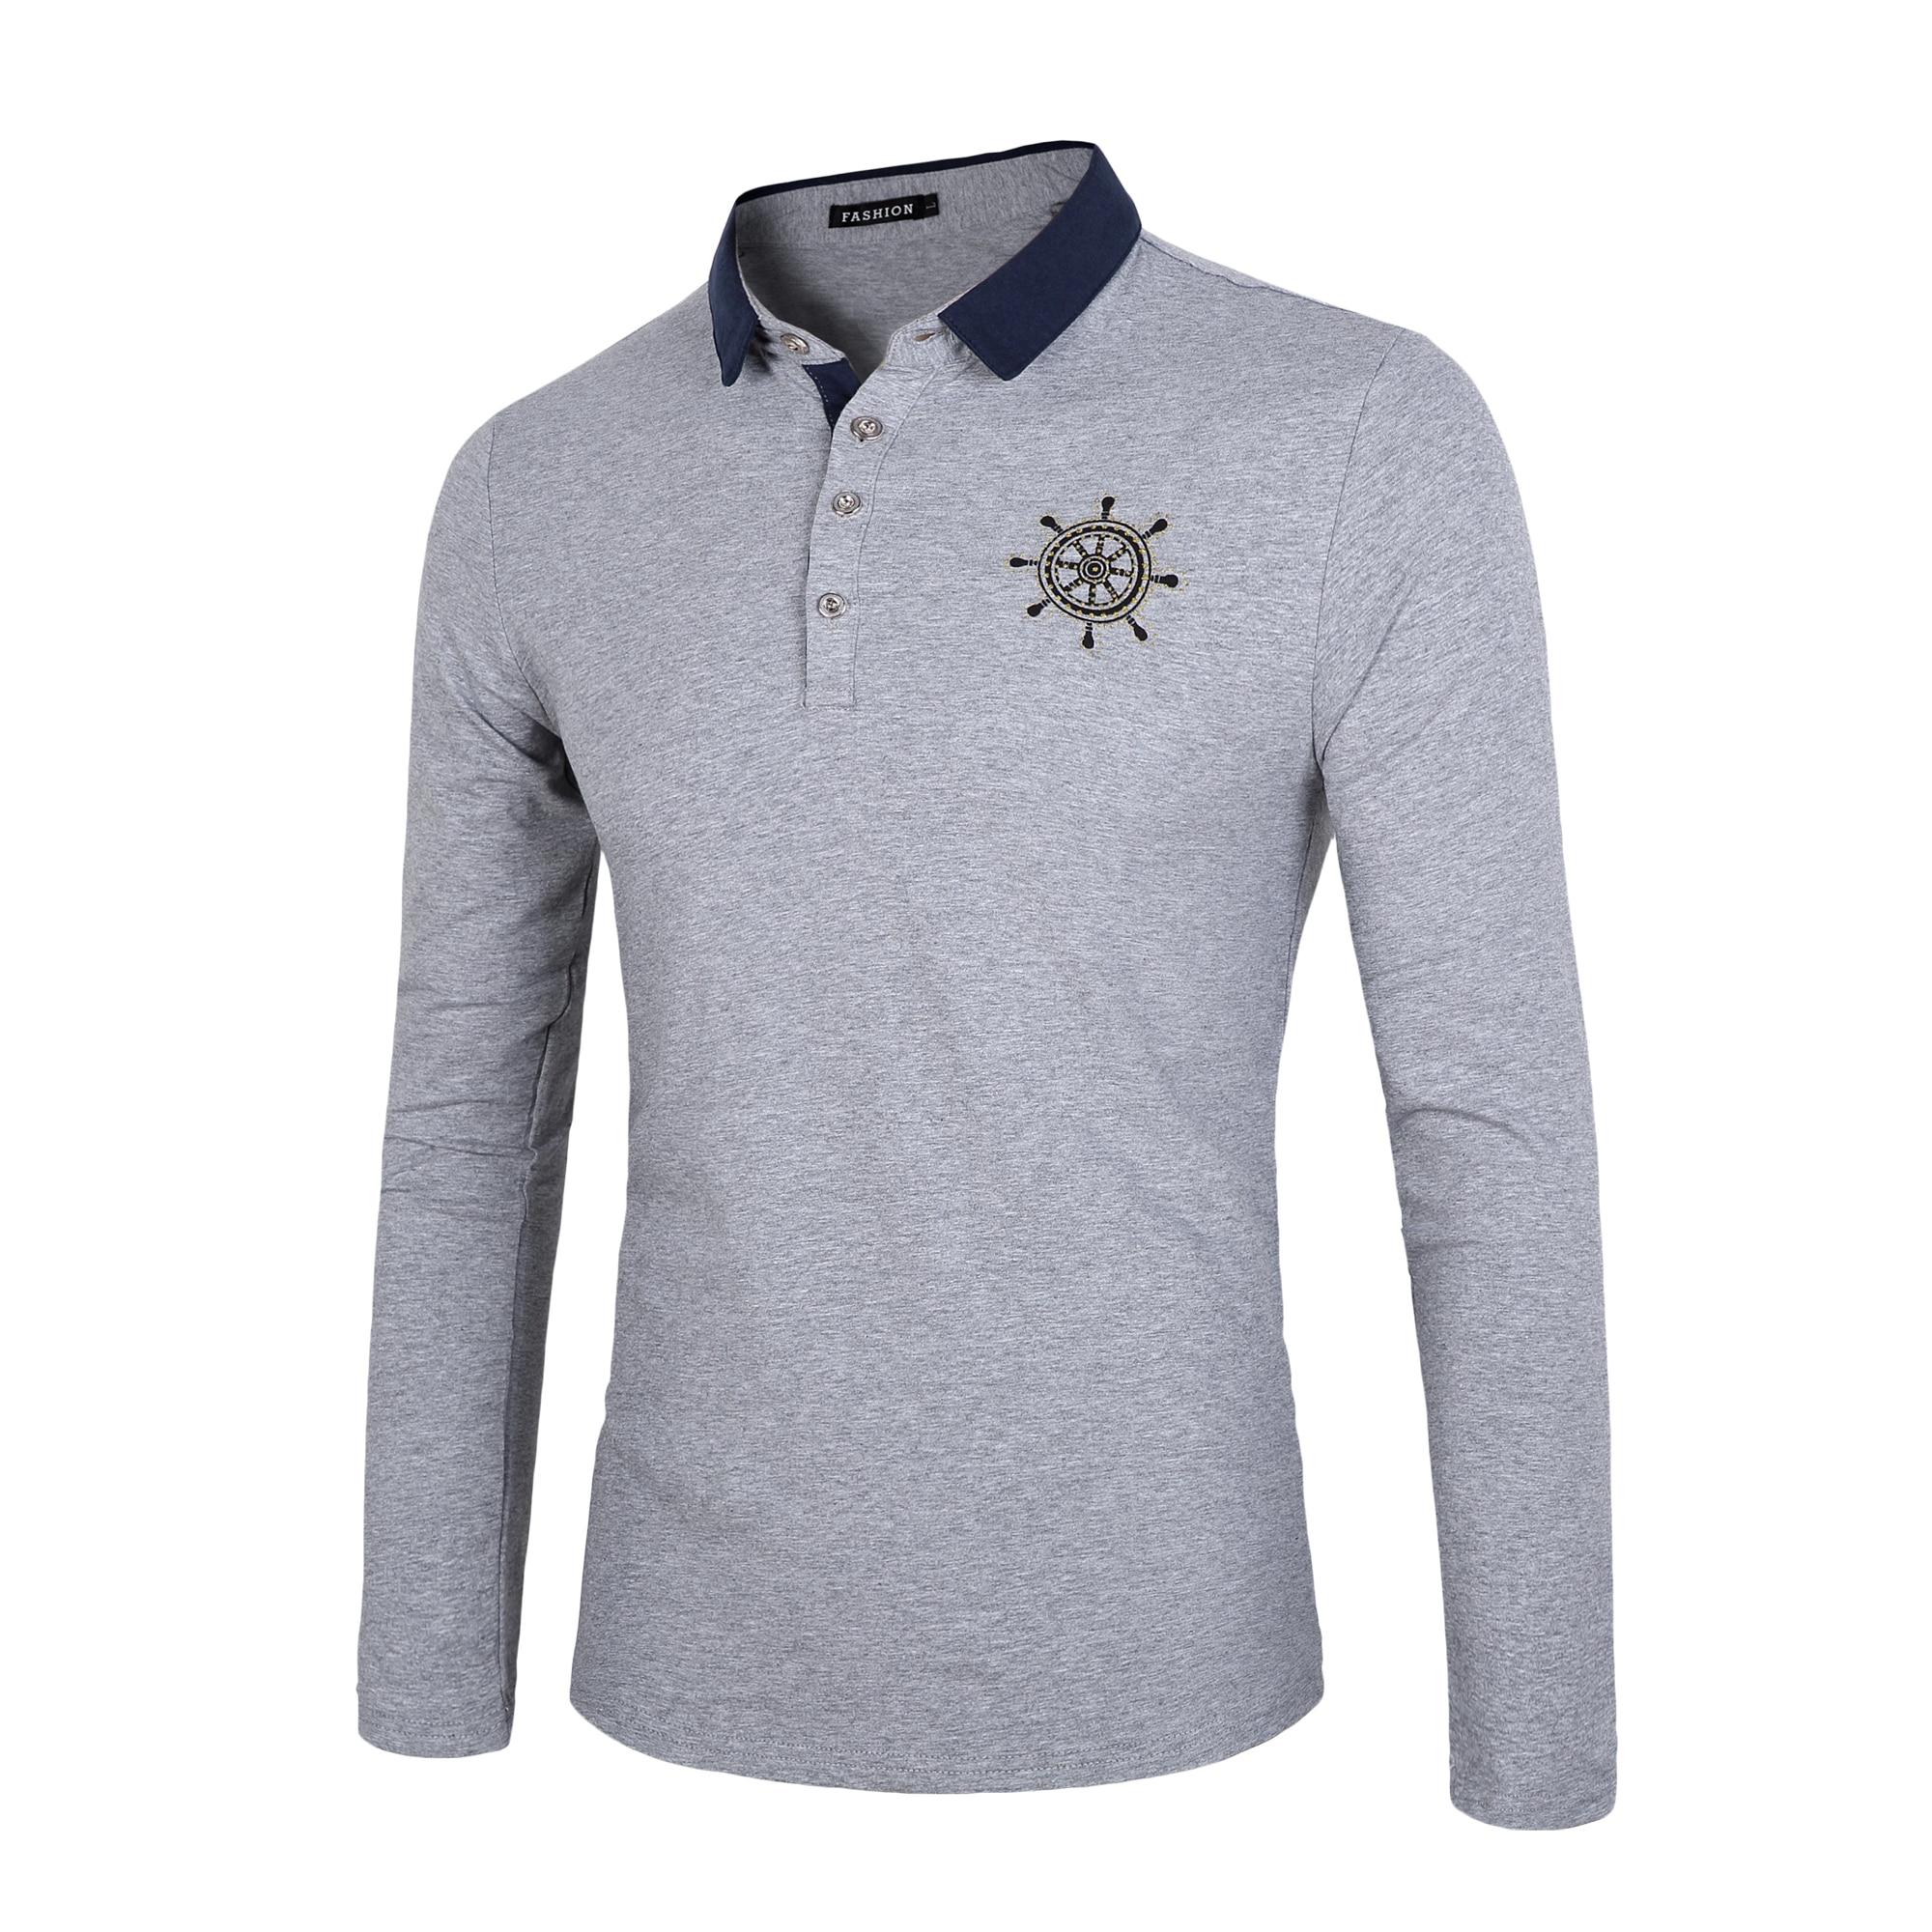 Shirt design for man 2016 - 2016 Famous Brand Polo Men Logo Designer Polo Shirts Pure Color Leisure Cotton Polo Homme Man